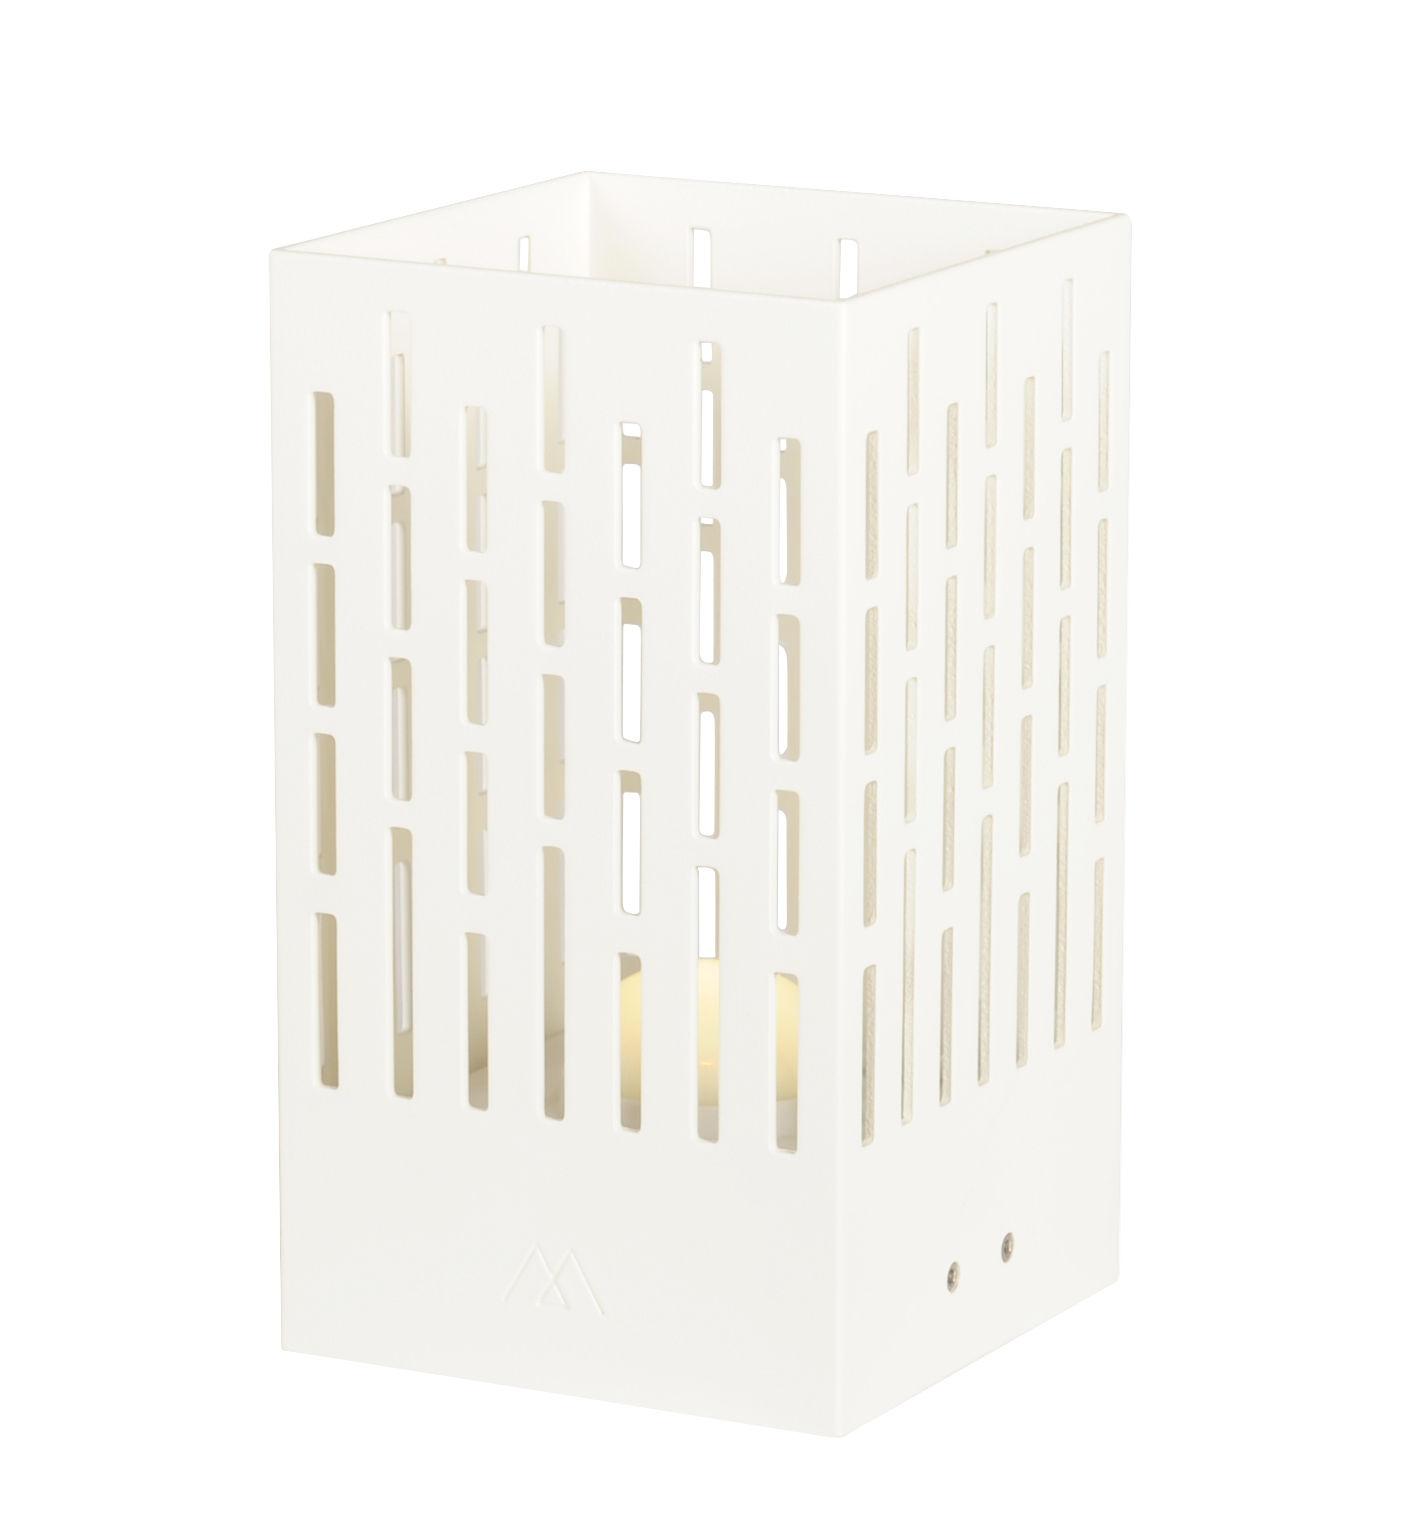 Luminaire - Lampes de table - Lampe solaire La Lampe Pose 04 / LED - Dock USB - Sans fil - Maiori - Blanc - Aluminium